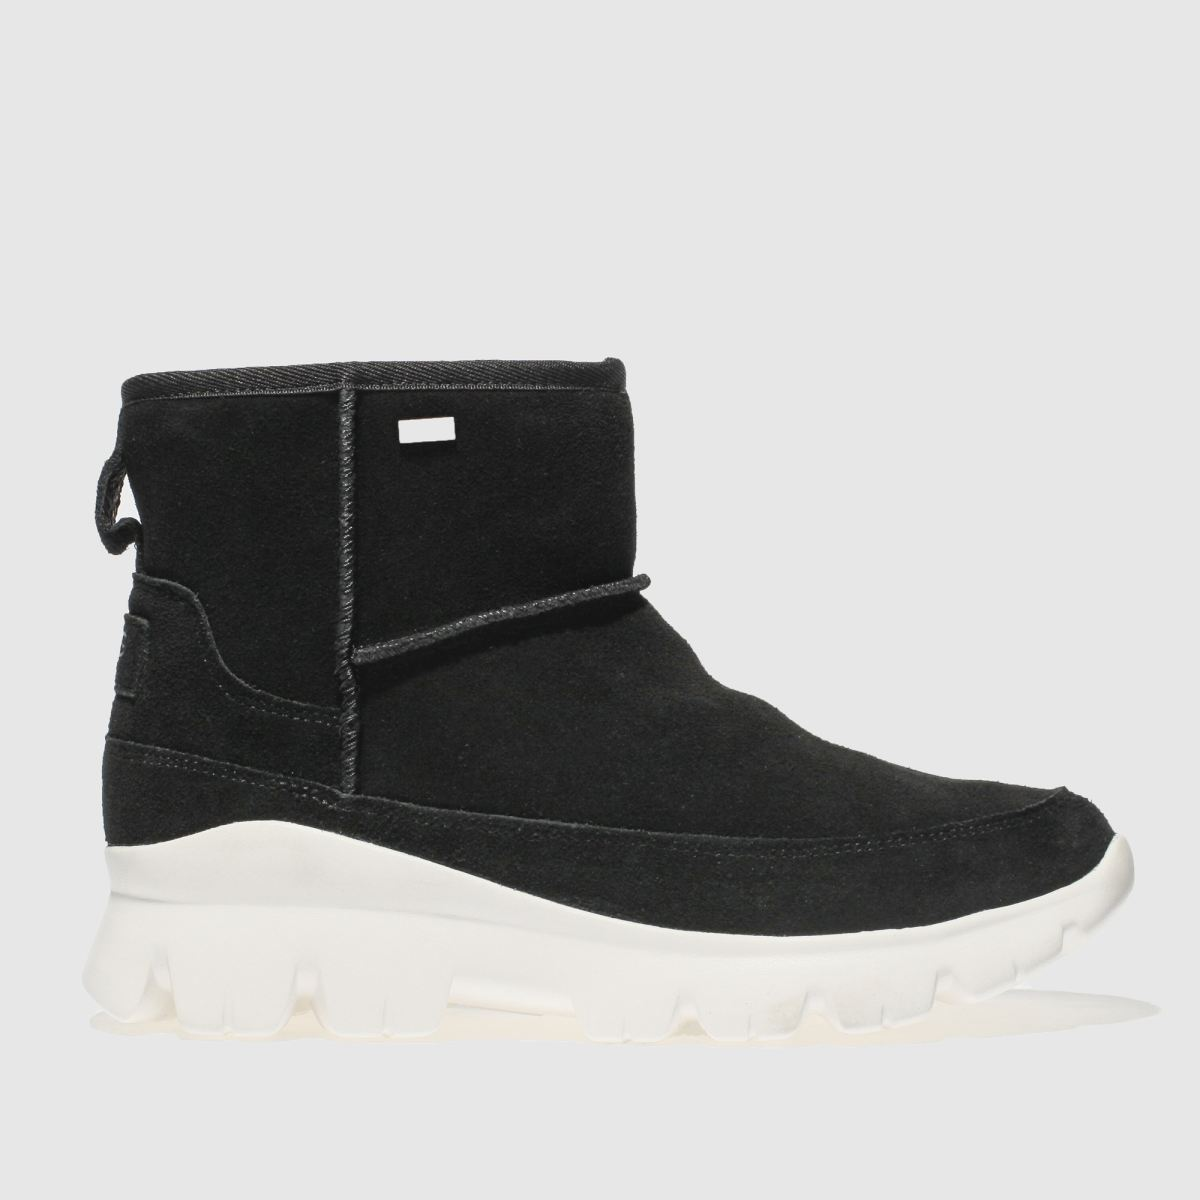 Ugg Black Palomar Sneaker Trainers